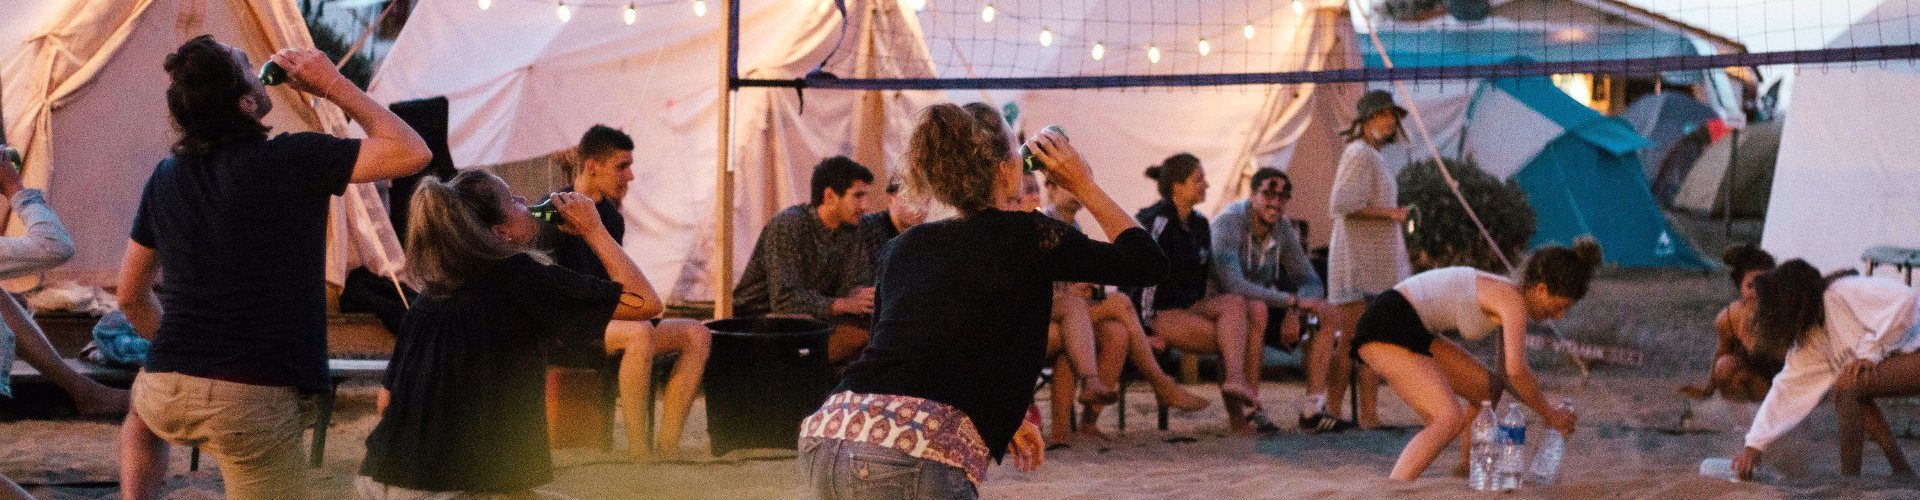 Tiendas glamping en surf camp Vieux Boucau